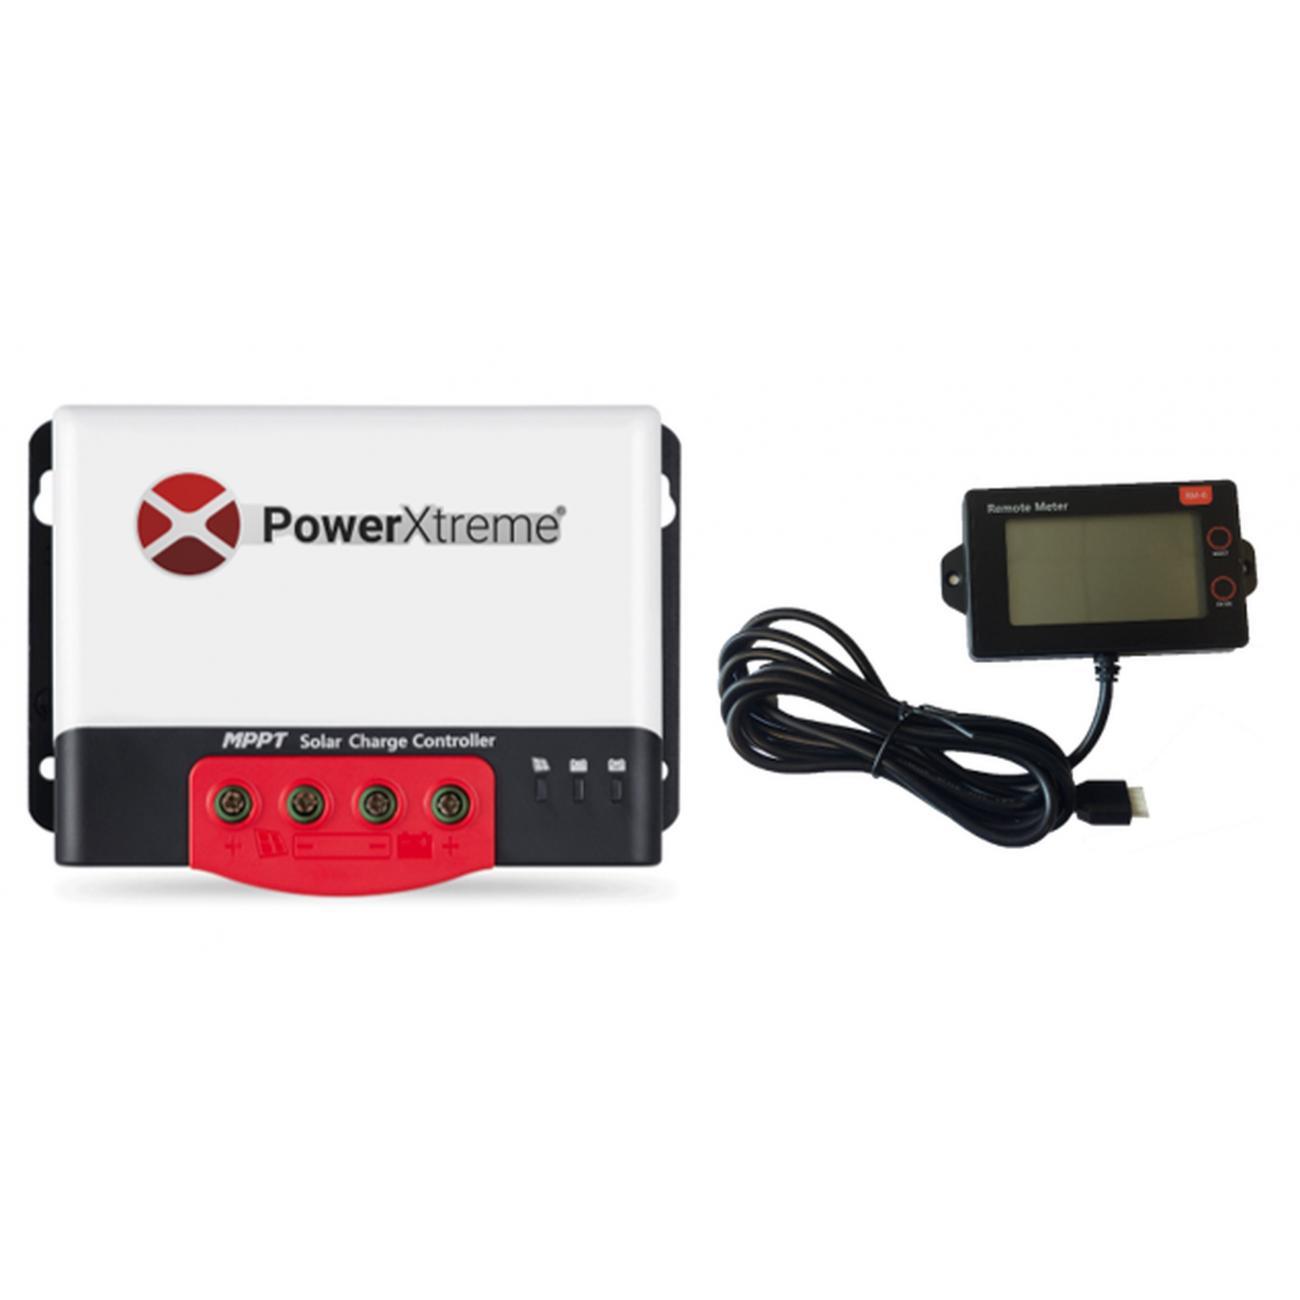 MPPT Solarladeregler PowerXtreme XS20s Mit Display